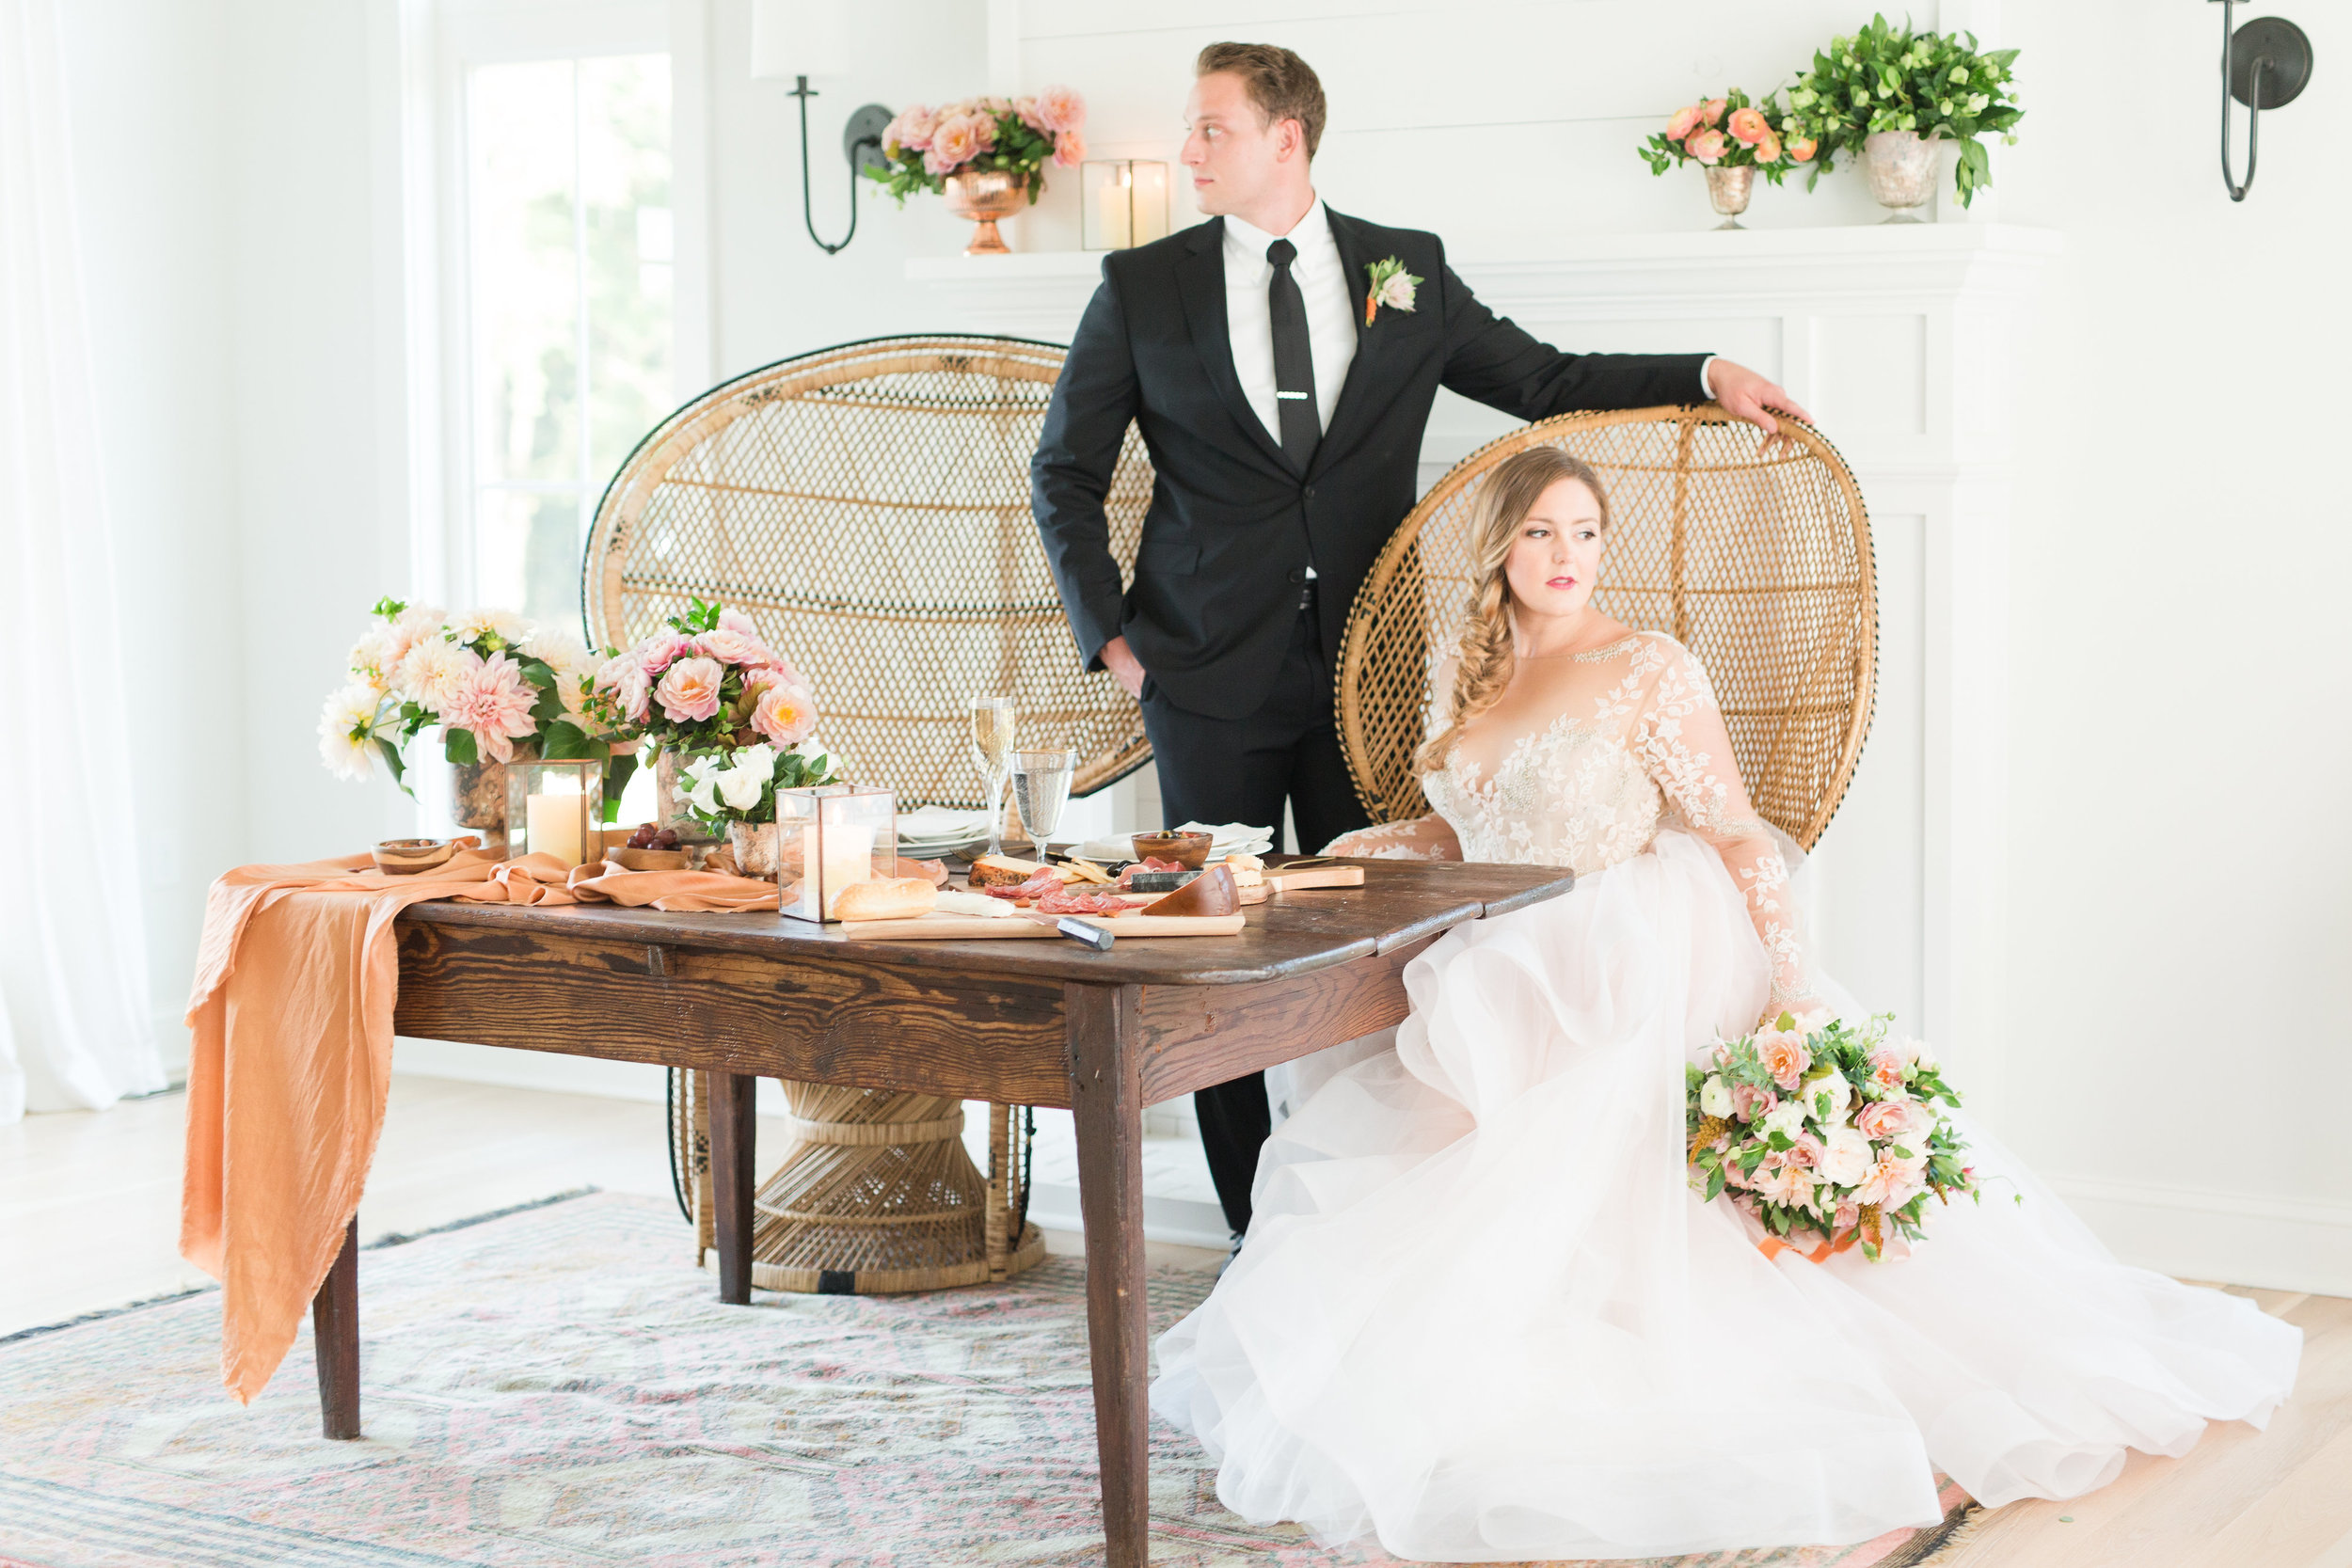 Courtney Inghram Katelyn James Richmond Wedding Photography Styled Shoot